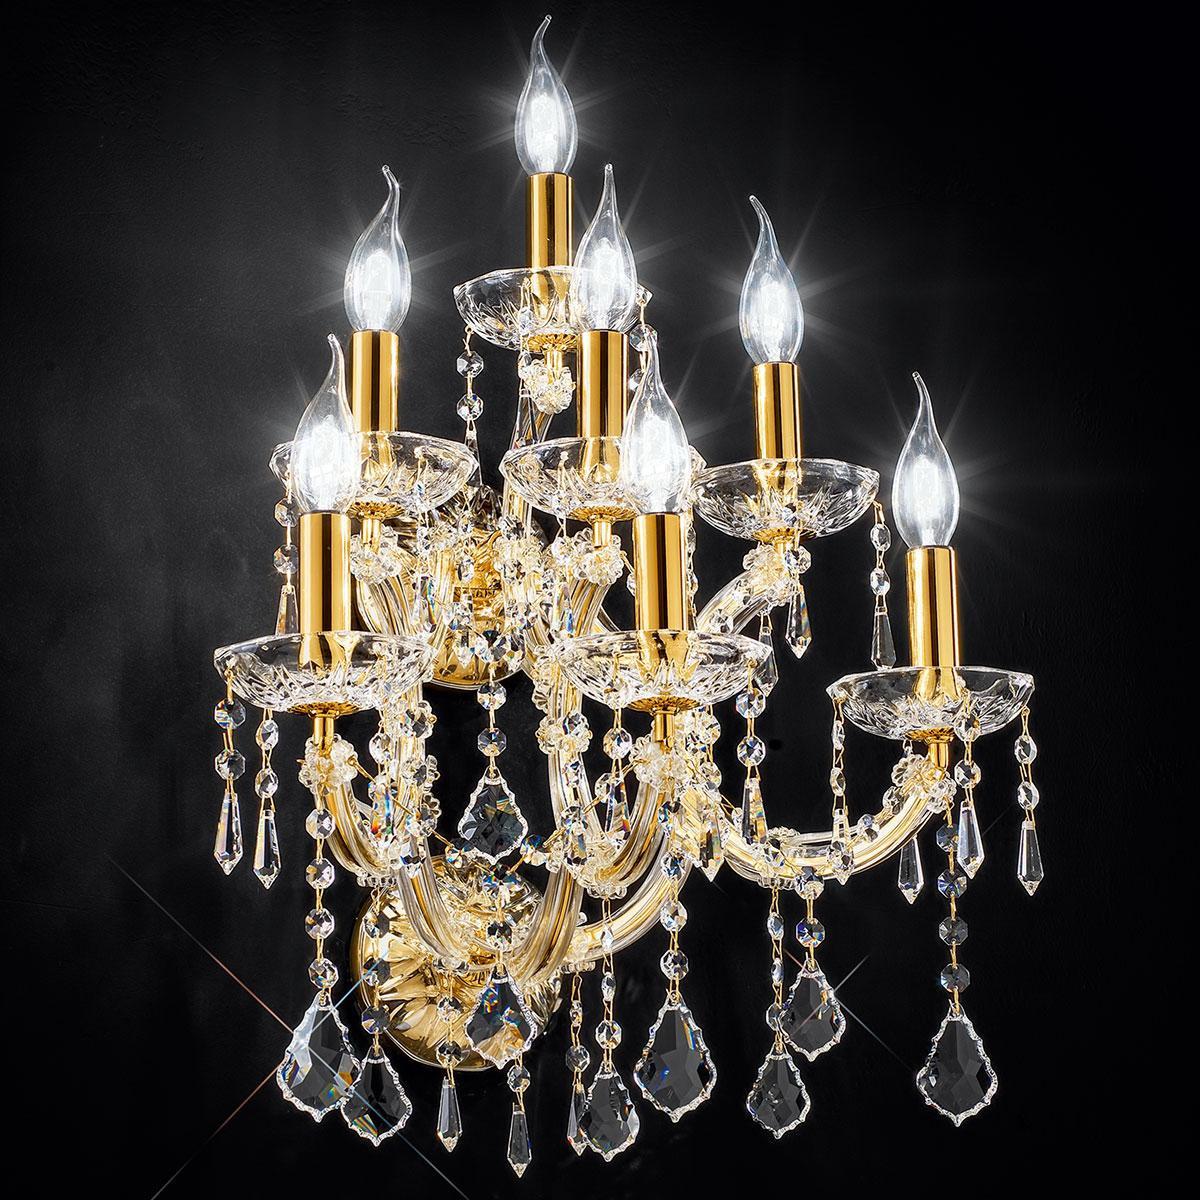 """Spilimbergo"" aplique veneciano de pared en cristal - 3+3+1 luces - transparent con cristal Asfour"